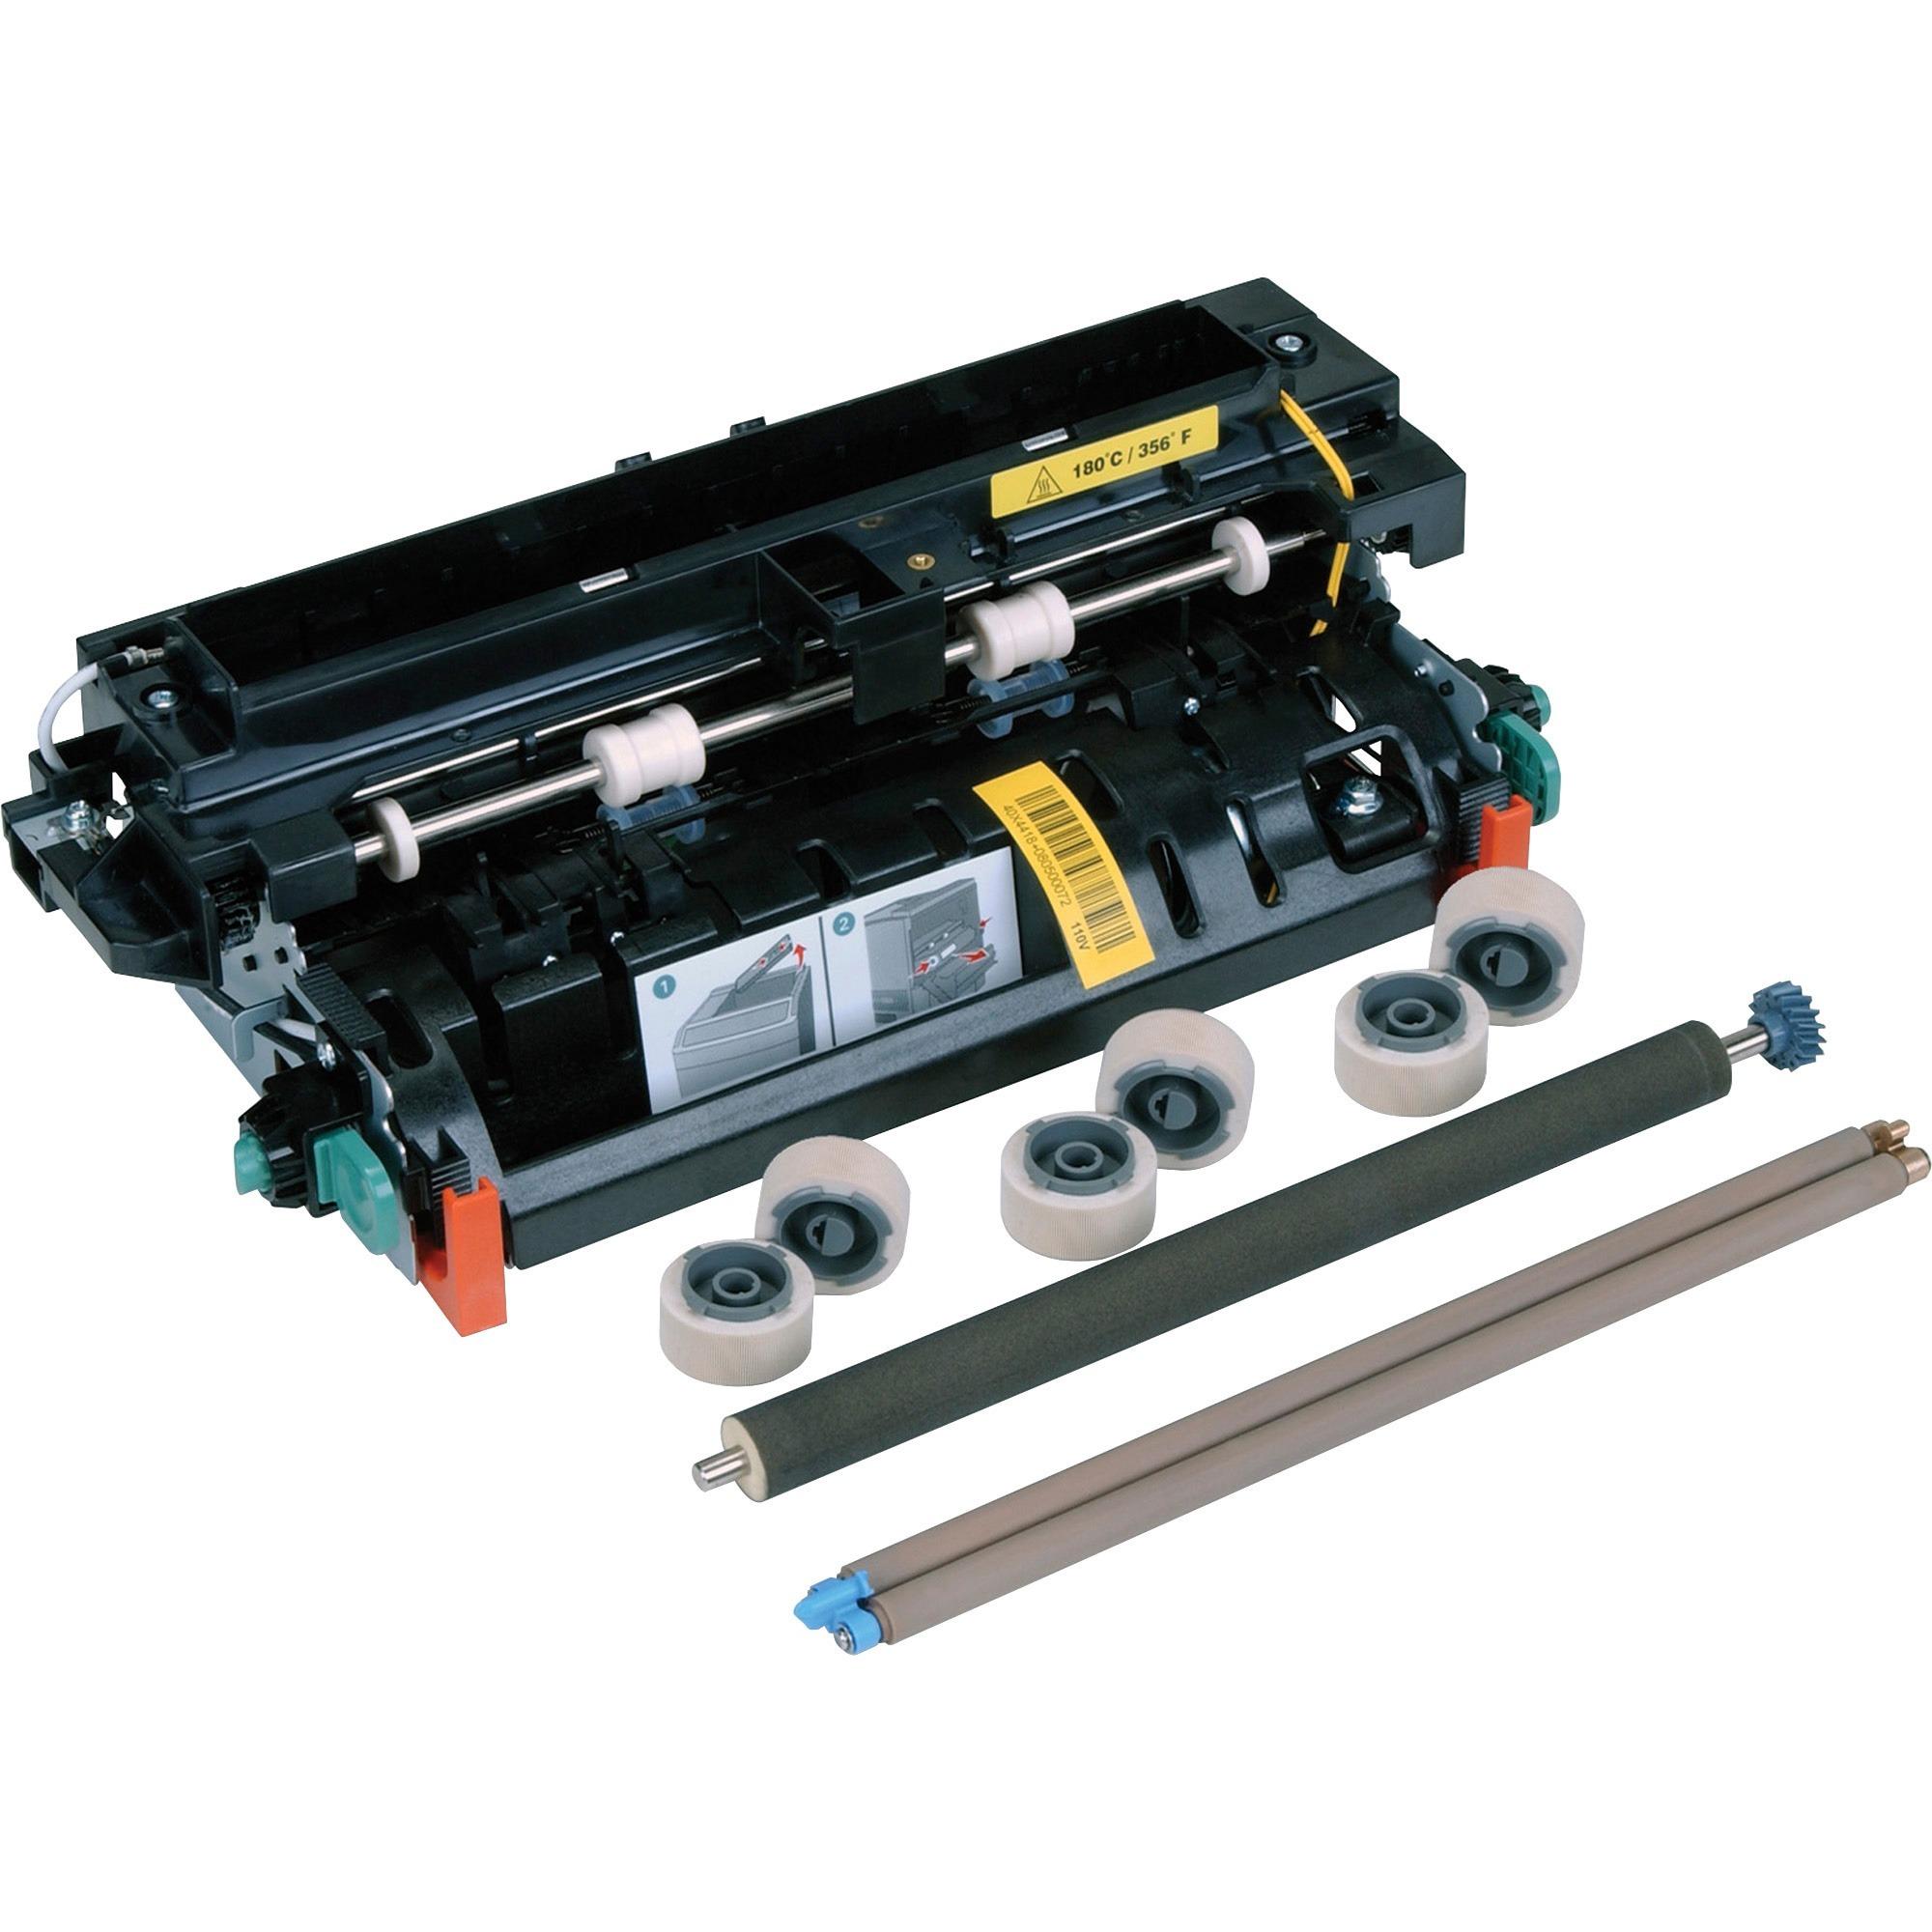 Lexmark 40X4724 Fuser Maintenance Kit